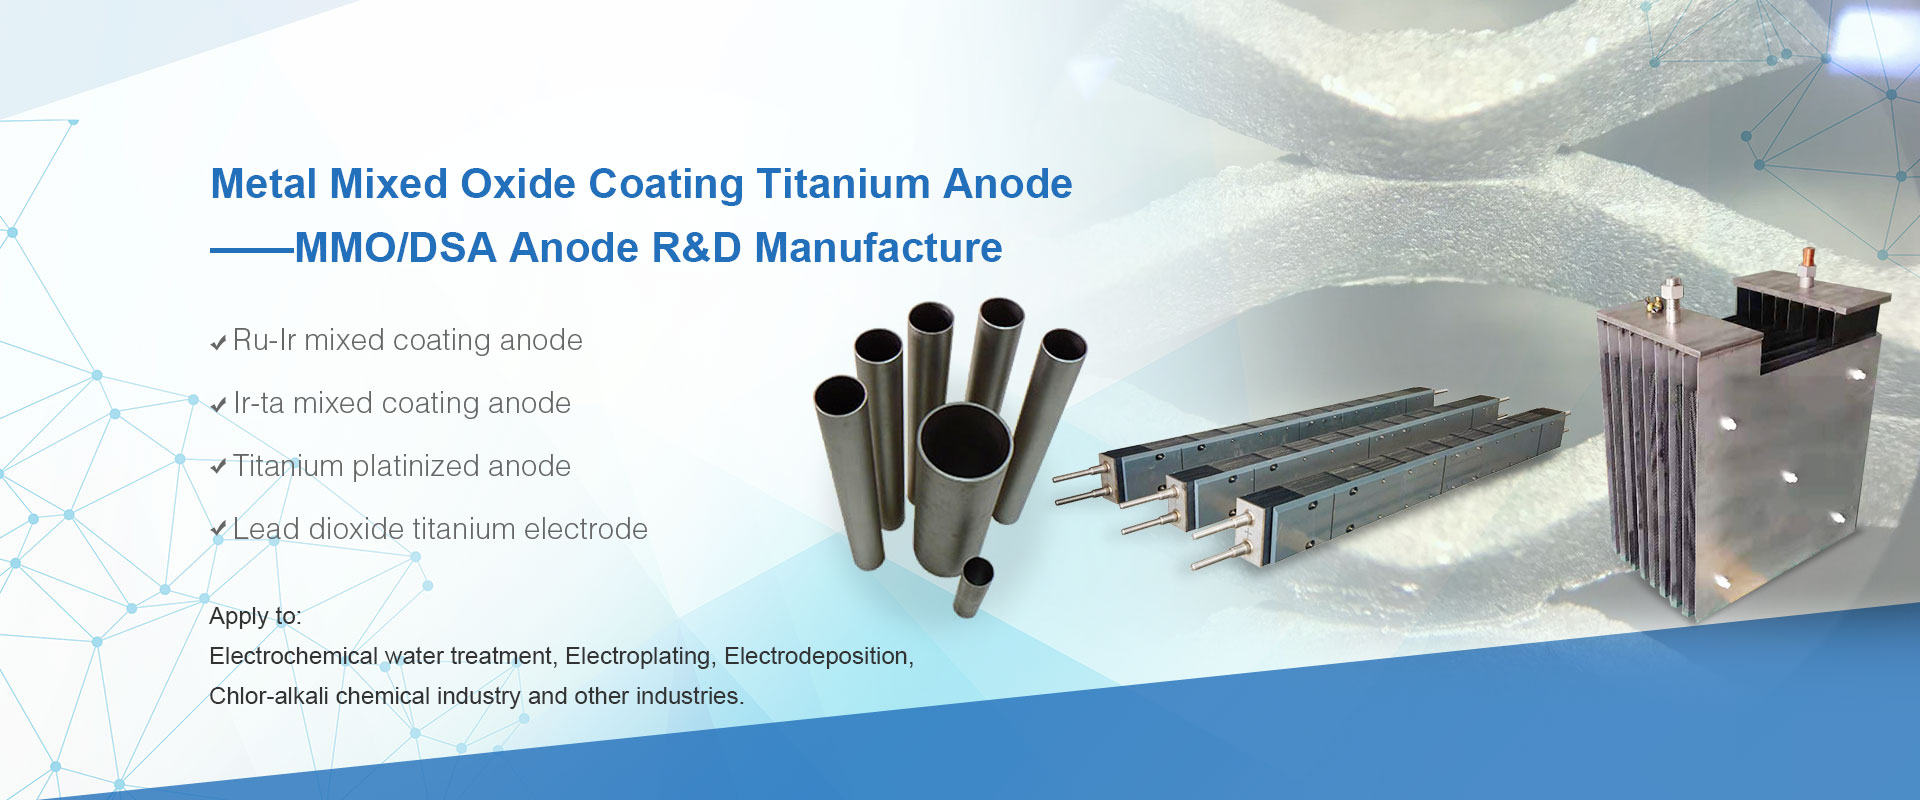 Lead Dioxide Titanium Electrode (Ti-PbO2)